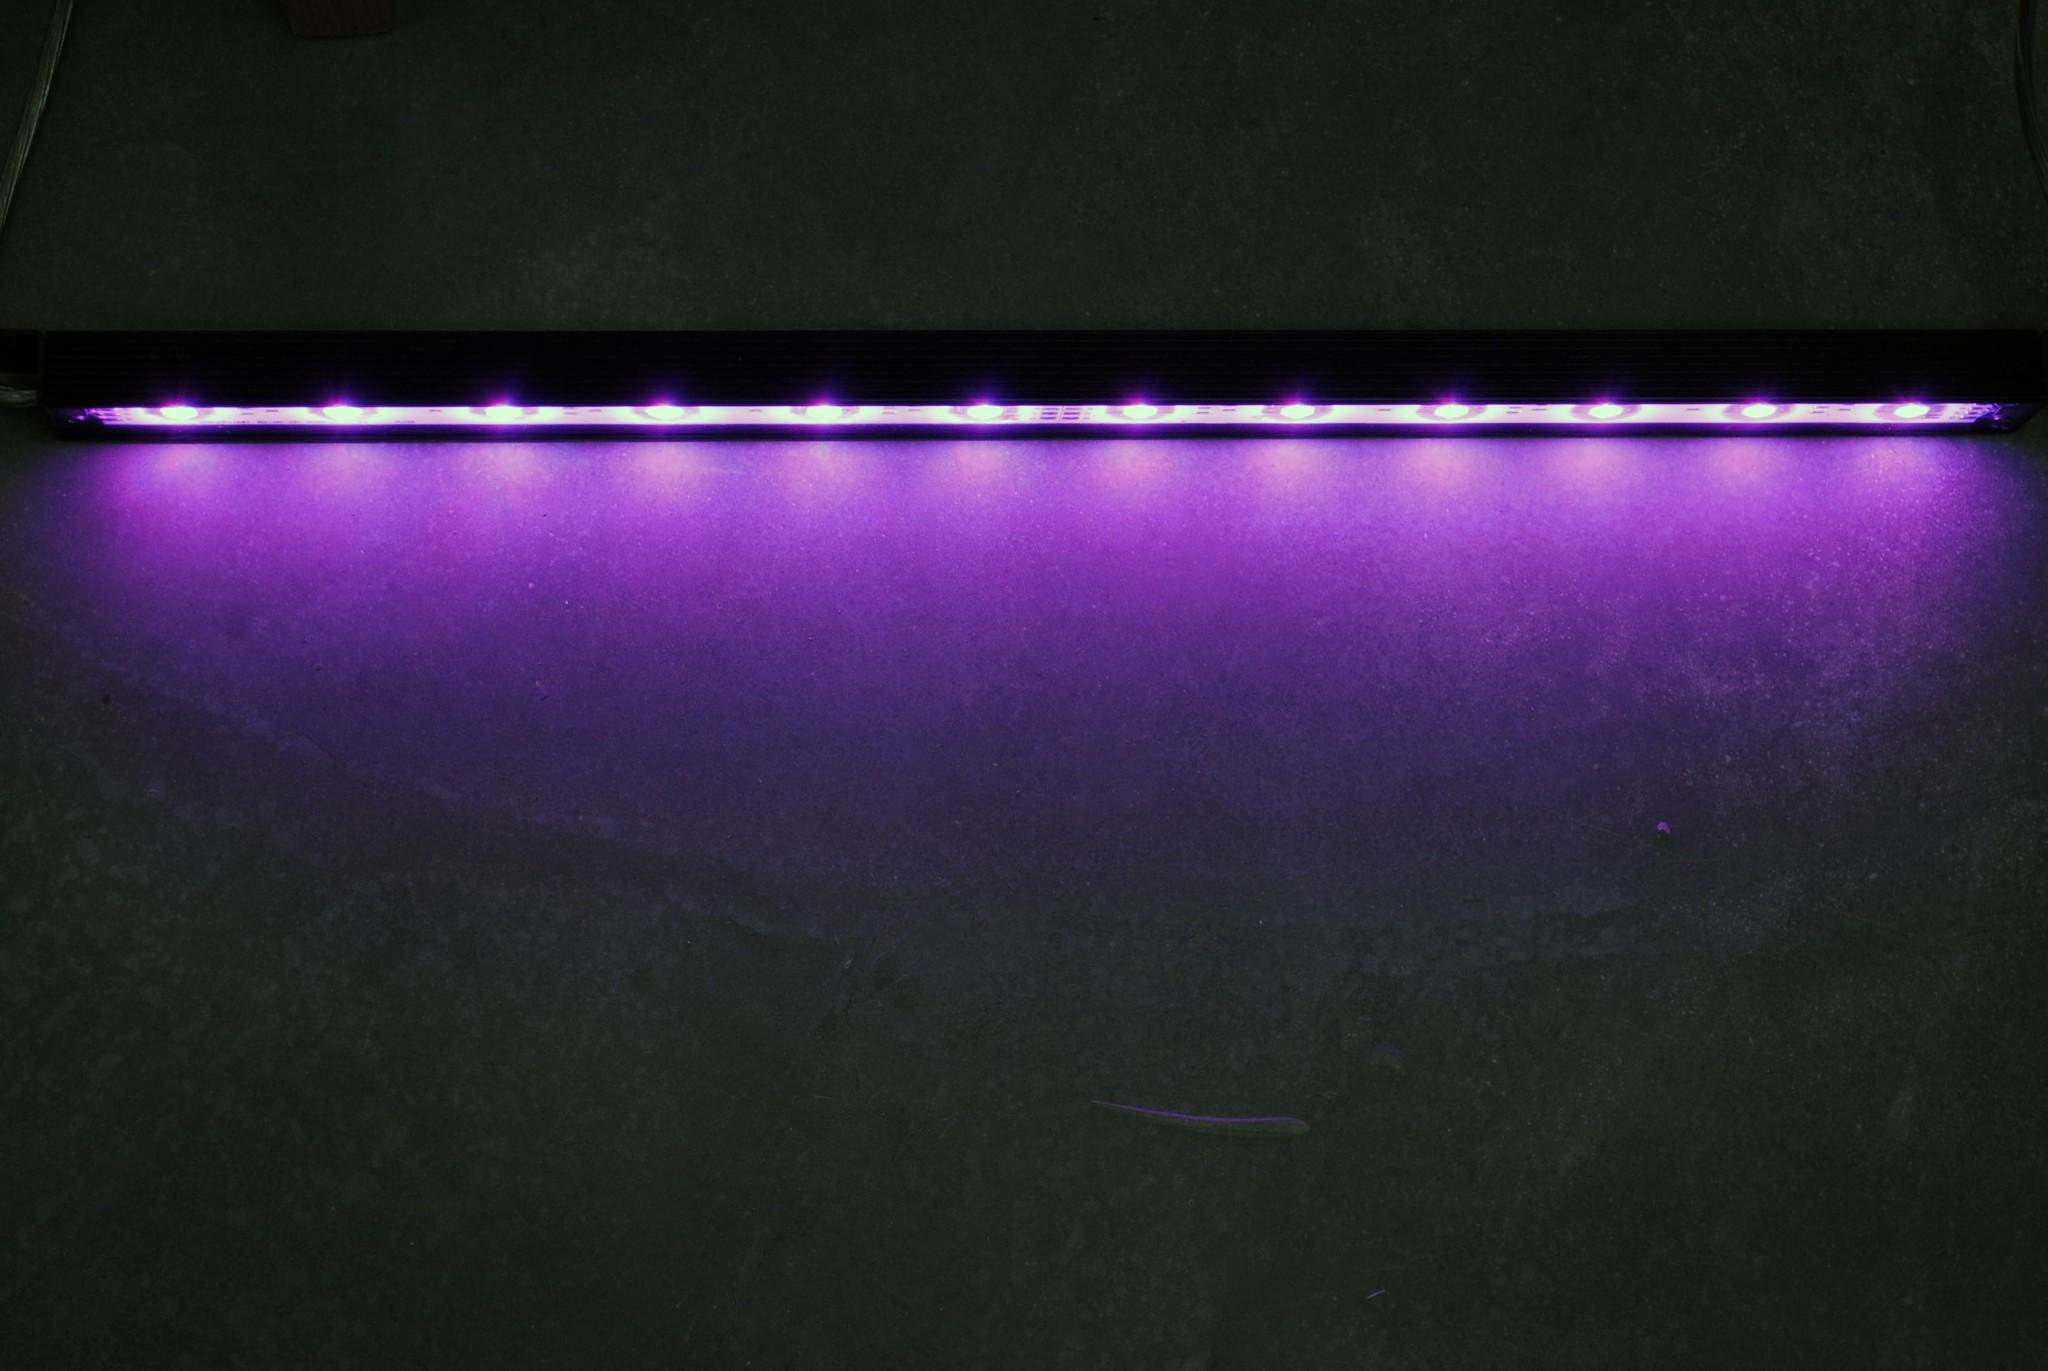 Barra LED de 50 cm LEDBAR PRO RGBWW IP68 Impermeable 12W 24V